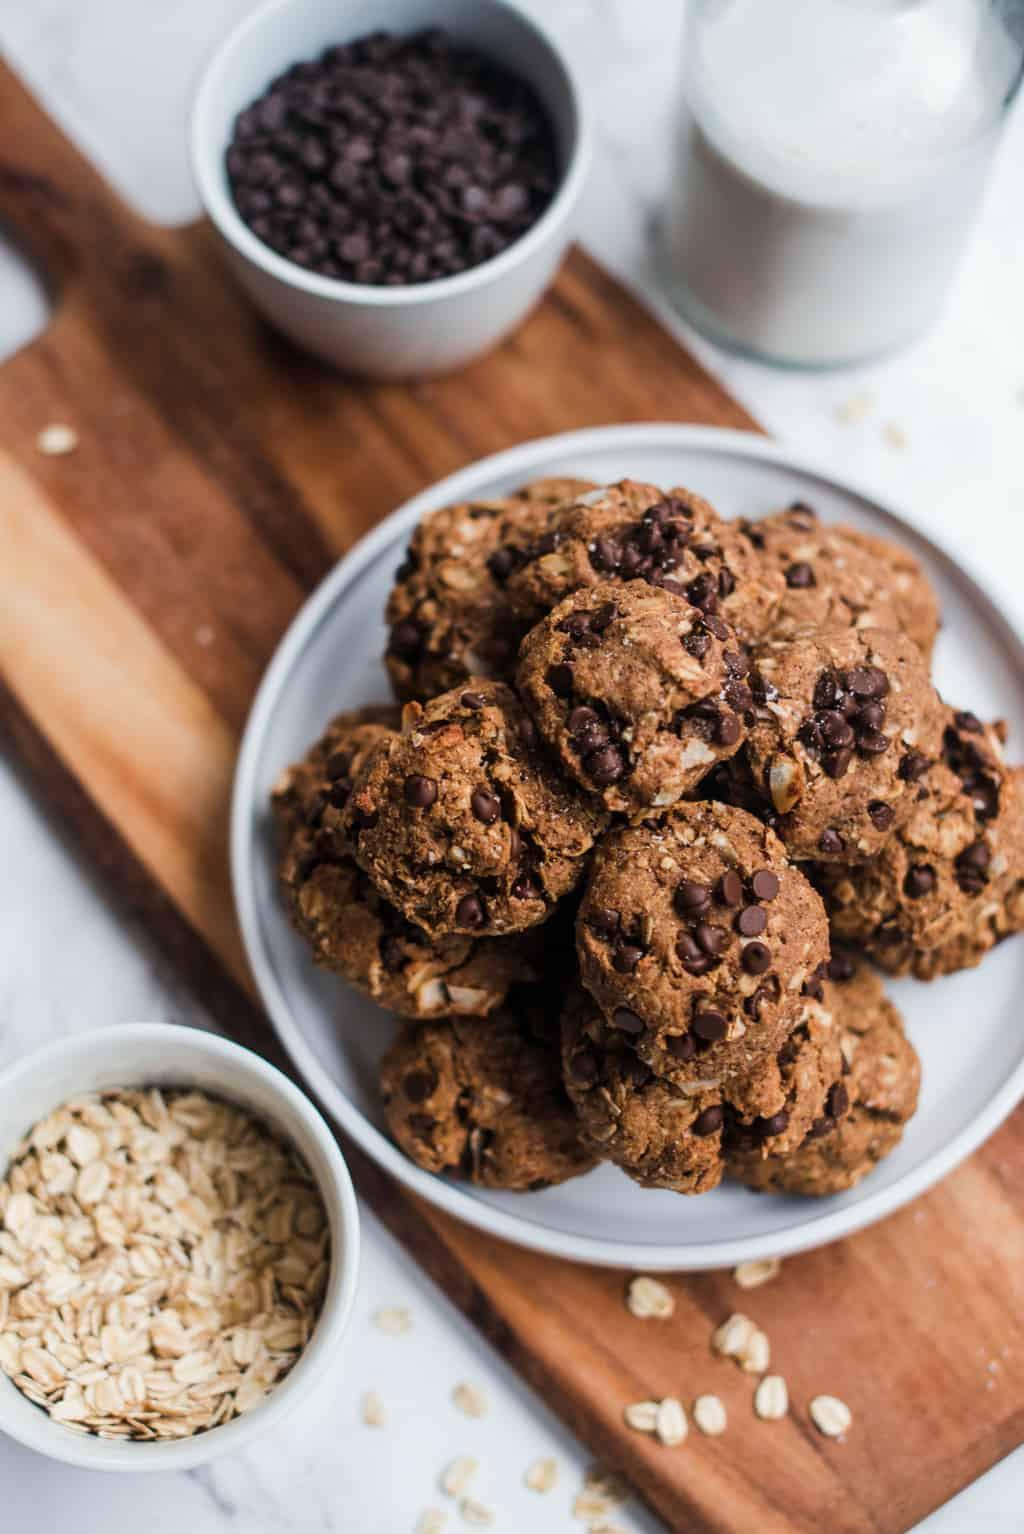 Vegan Coconut Cookies Recipes  Vegan Almond Butter Coconut Cookies Reluctant Entertainer